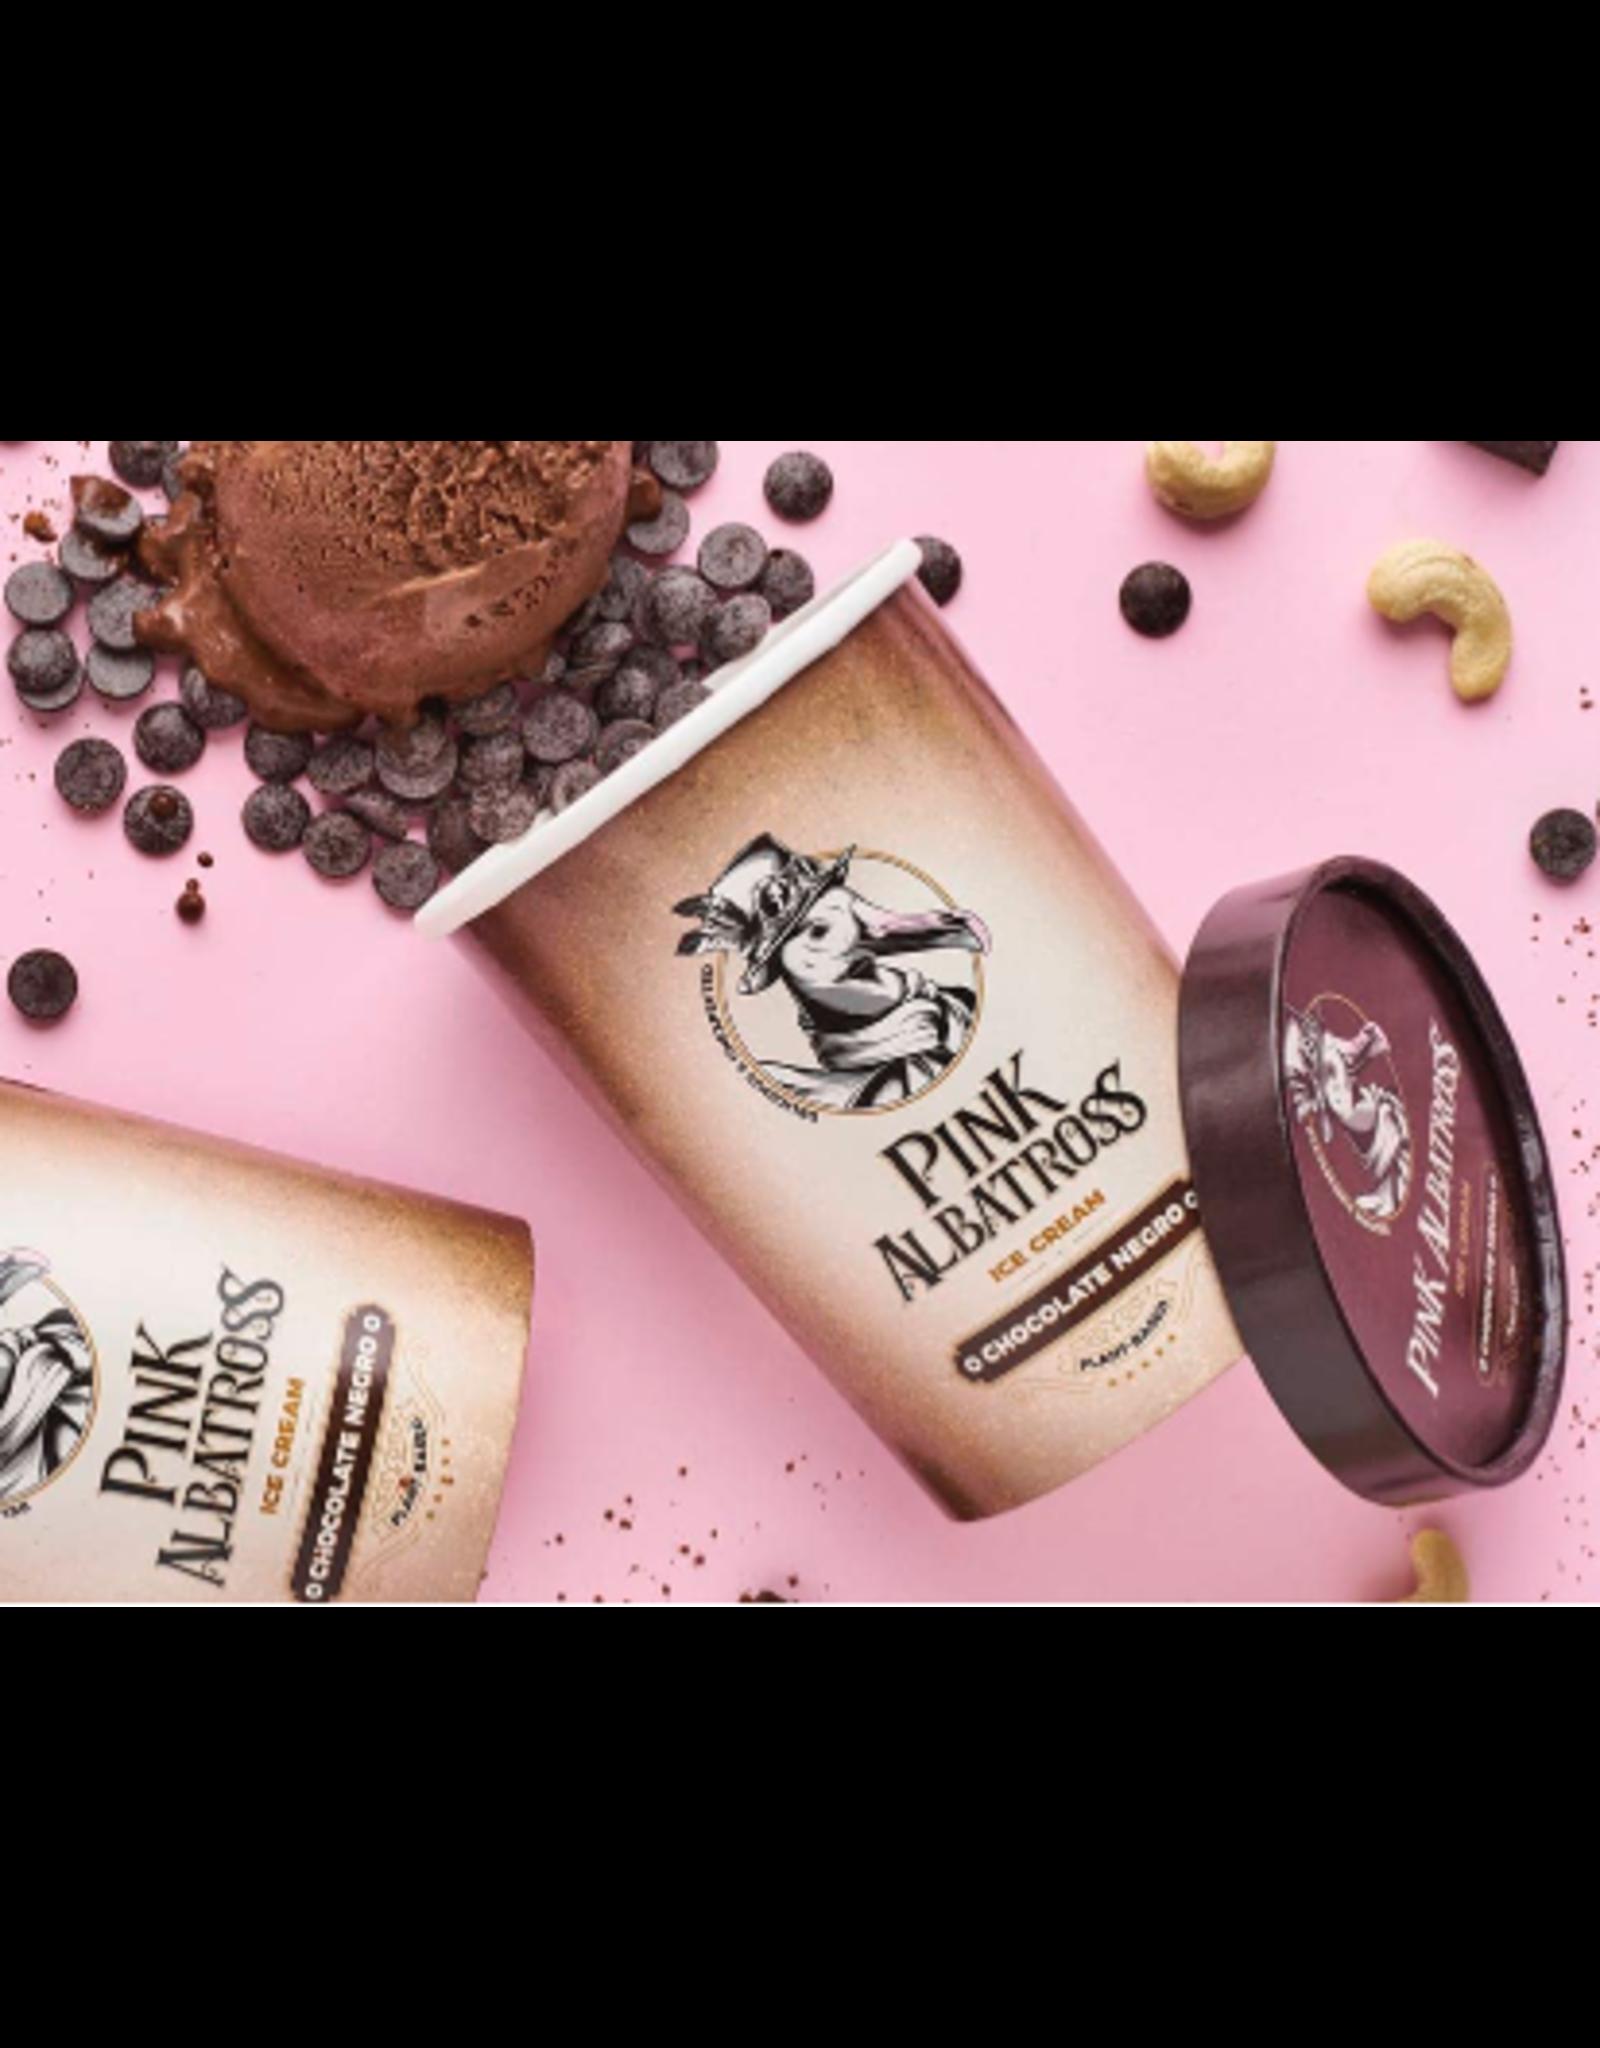 PinkAlbatross Dunkle Schokolade-Eiscreme 450ml